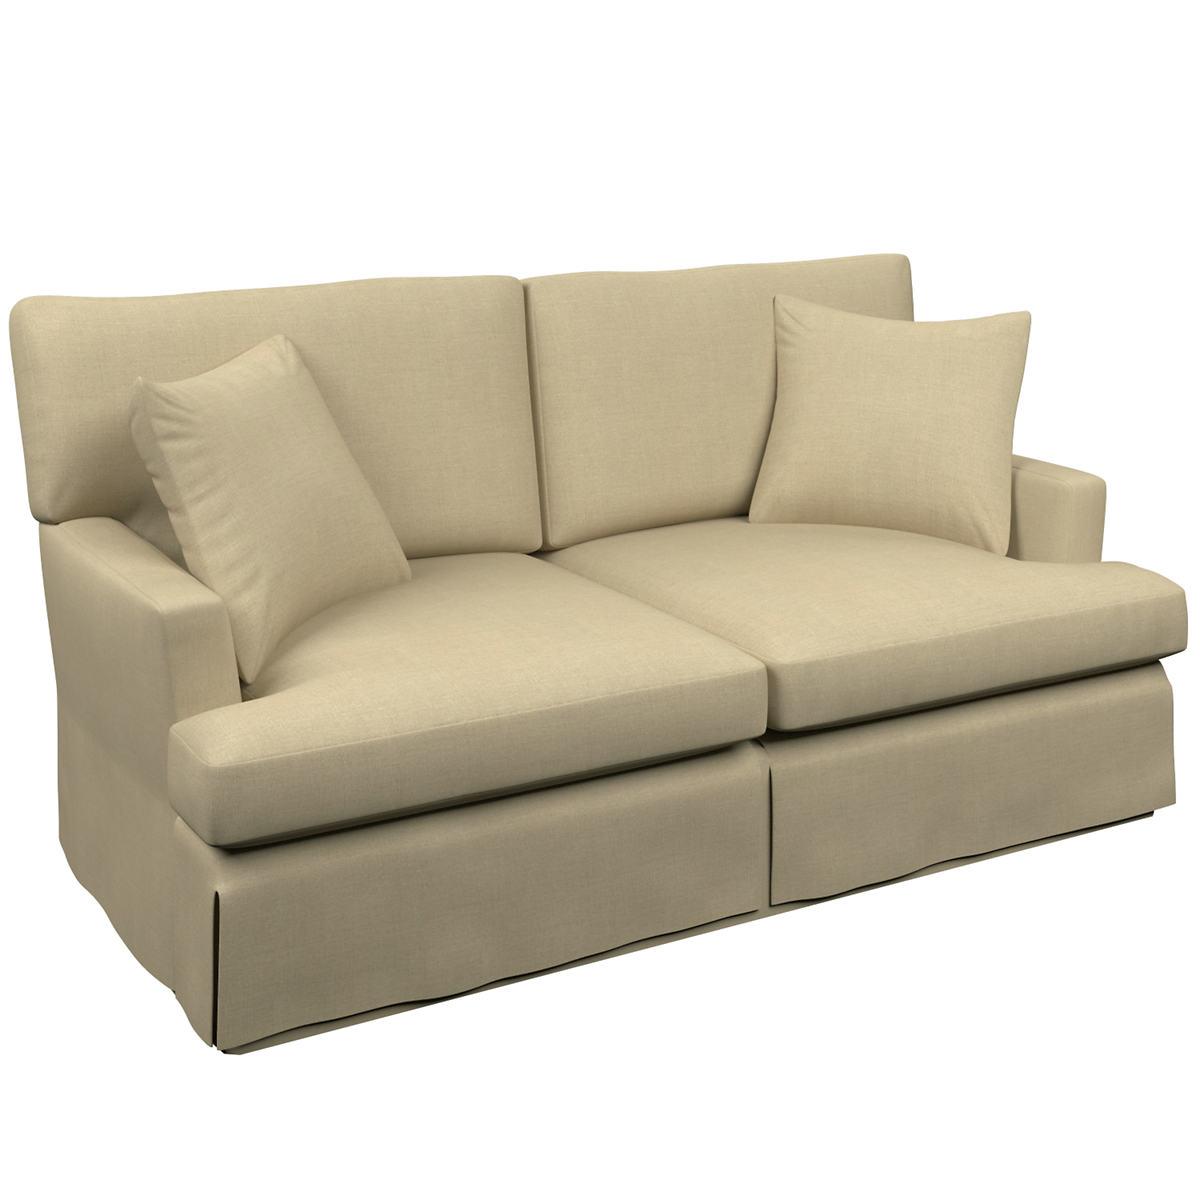 Estate Linen Natural Saybrook 2 Seater Slipcovered Sofa